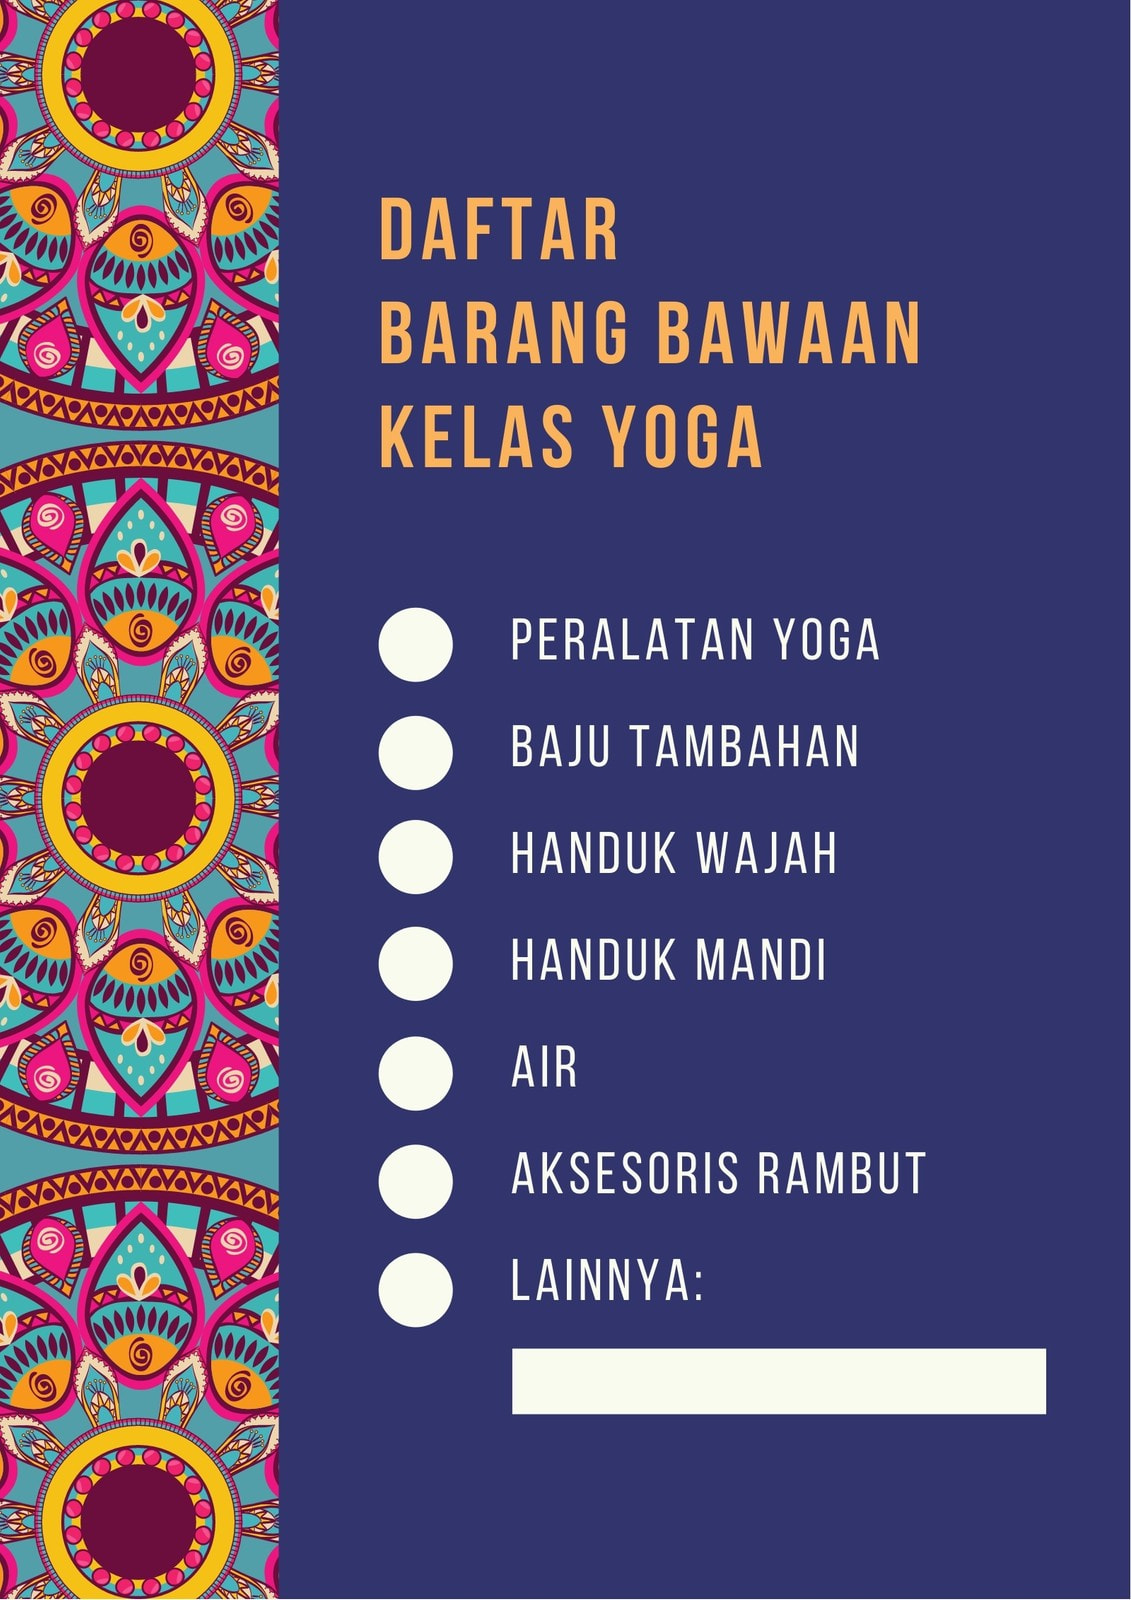 Daftar Periksa Barang Olahraga Yoga Mandala Biru